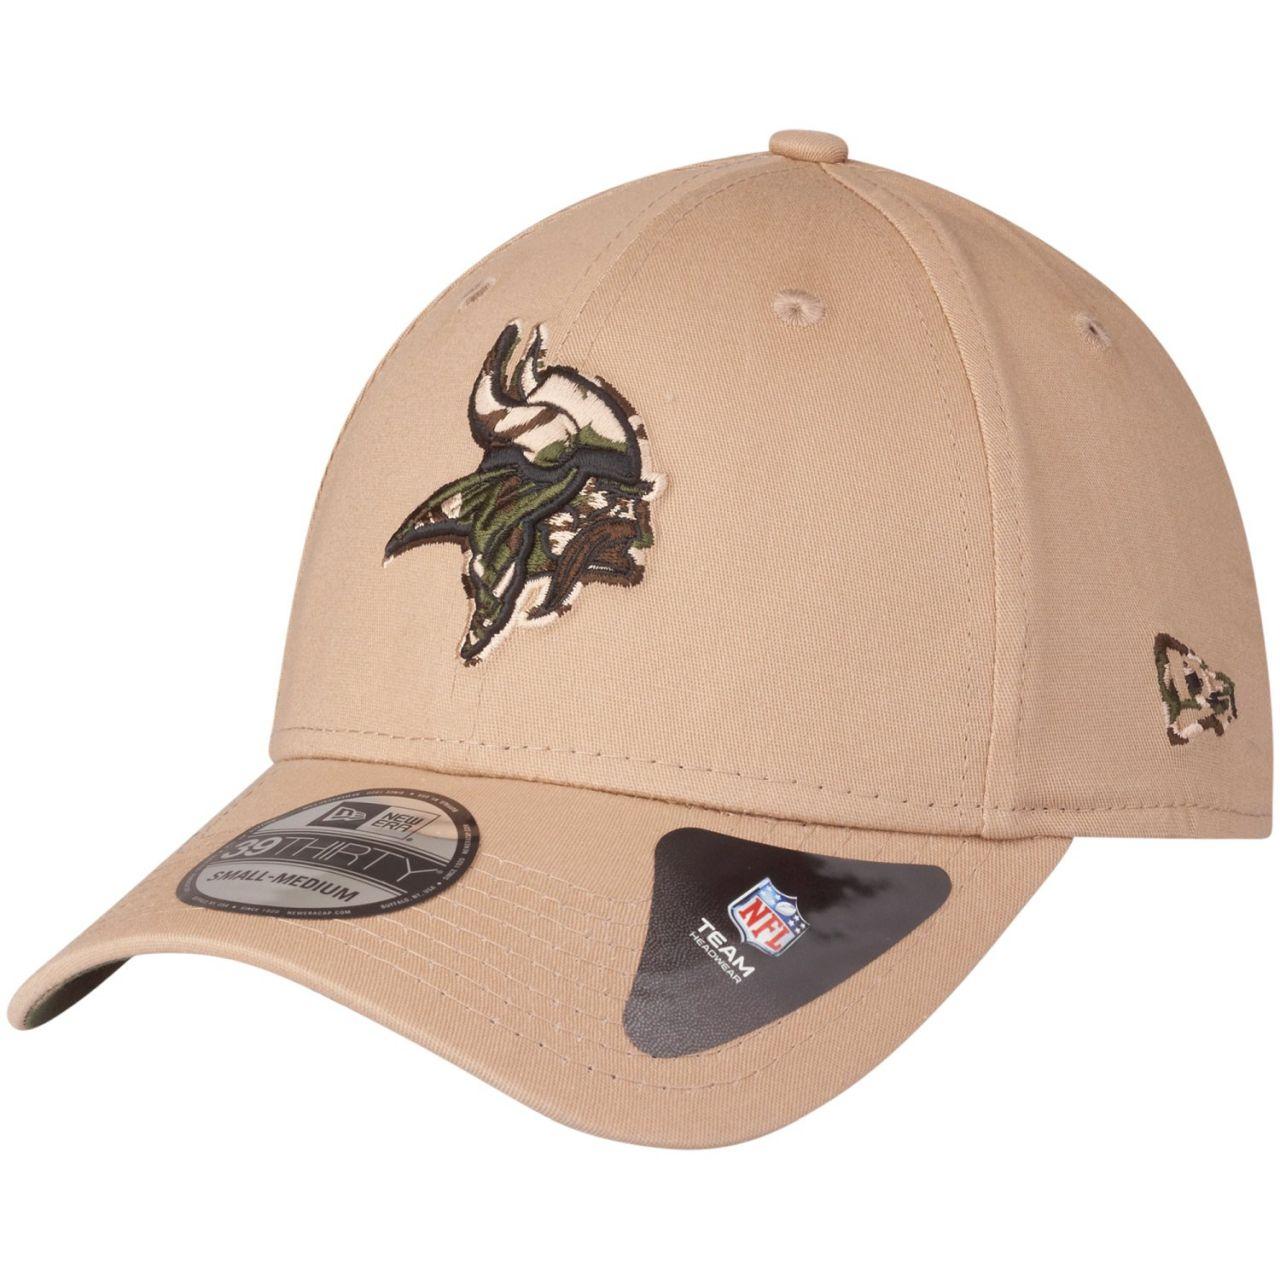 amfoo - New Era 39Thirty Stretch Cap - CAMO Minnesota Vikings